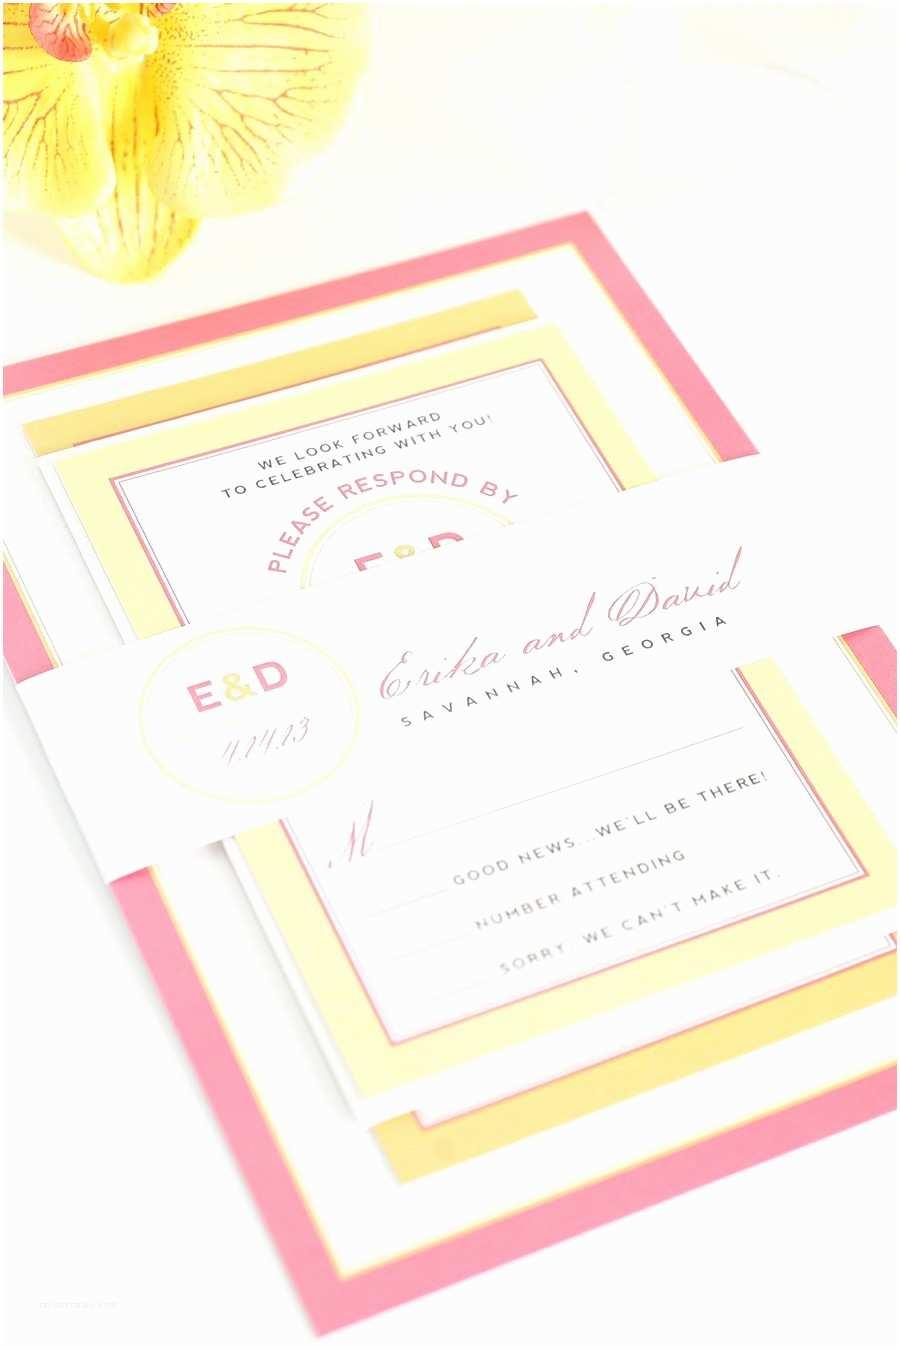 Orange Wedding Invitations Pink and orange Wedding Invitations with Yellow Accents